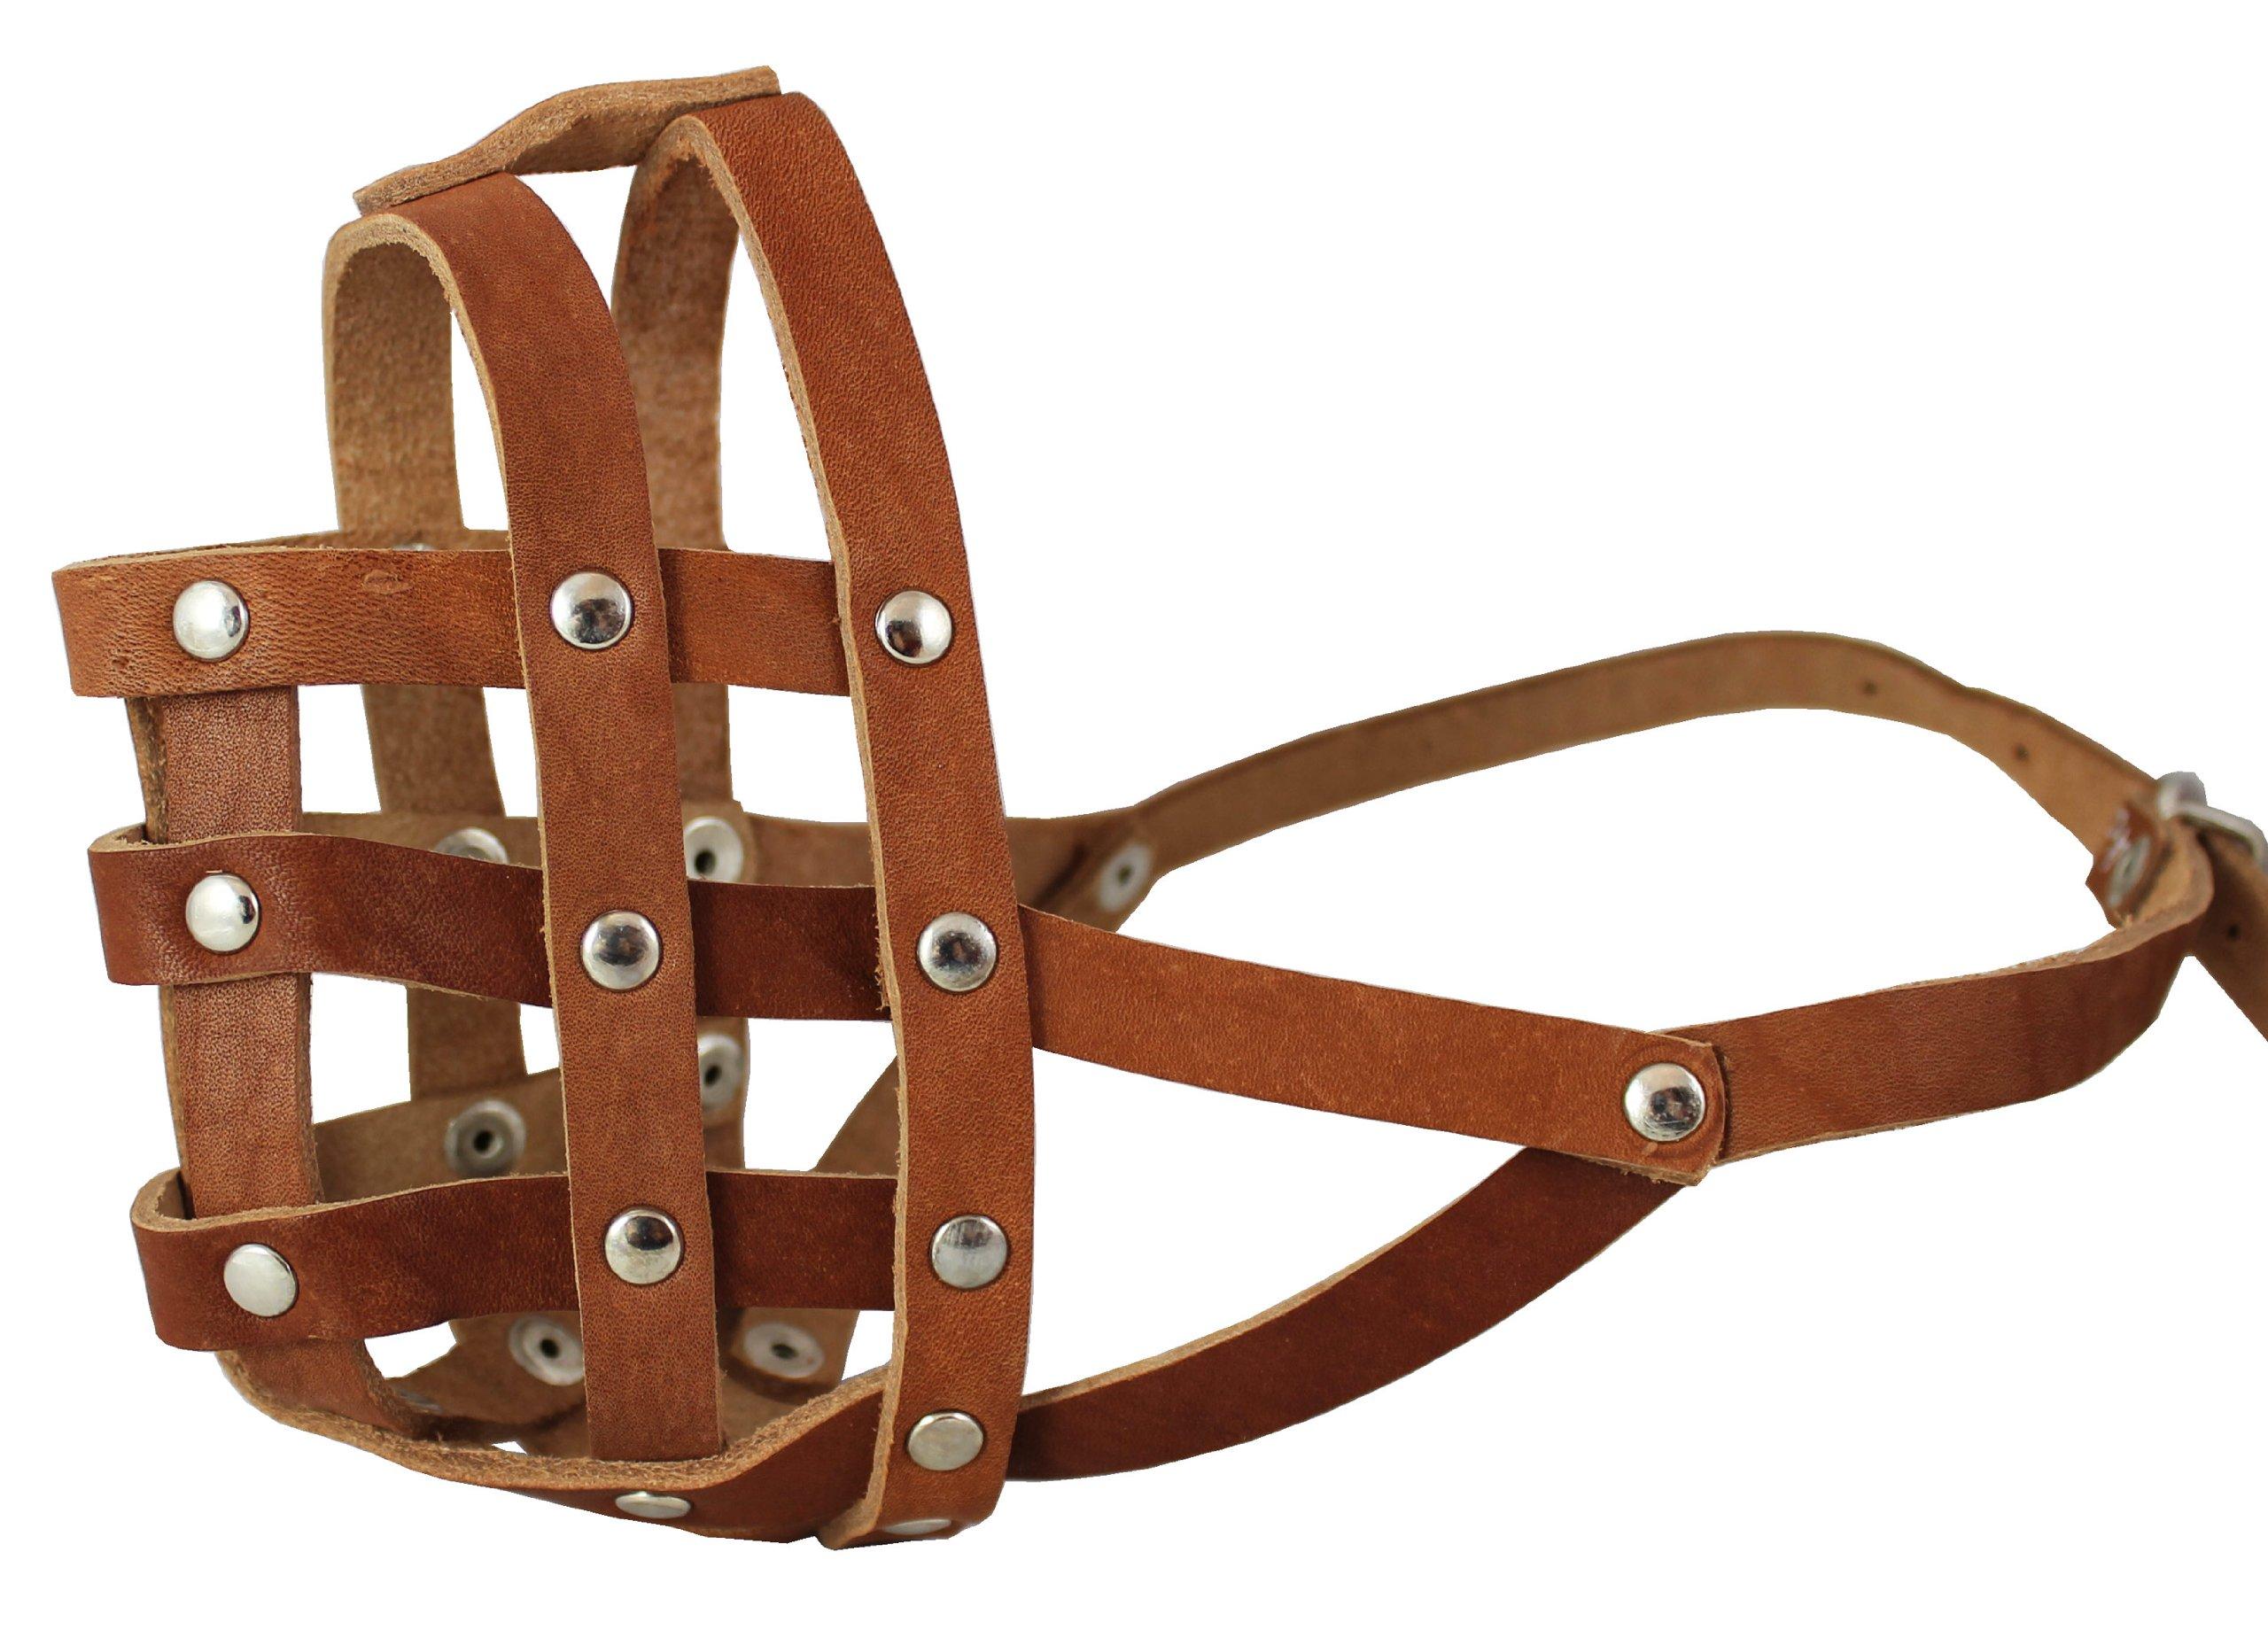 Real Leather Dog Basket Dog Dog Muzzle #110 Brown - Bulldog (Circumference 13.7'', Snout Length 2.75'')